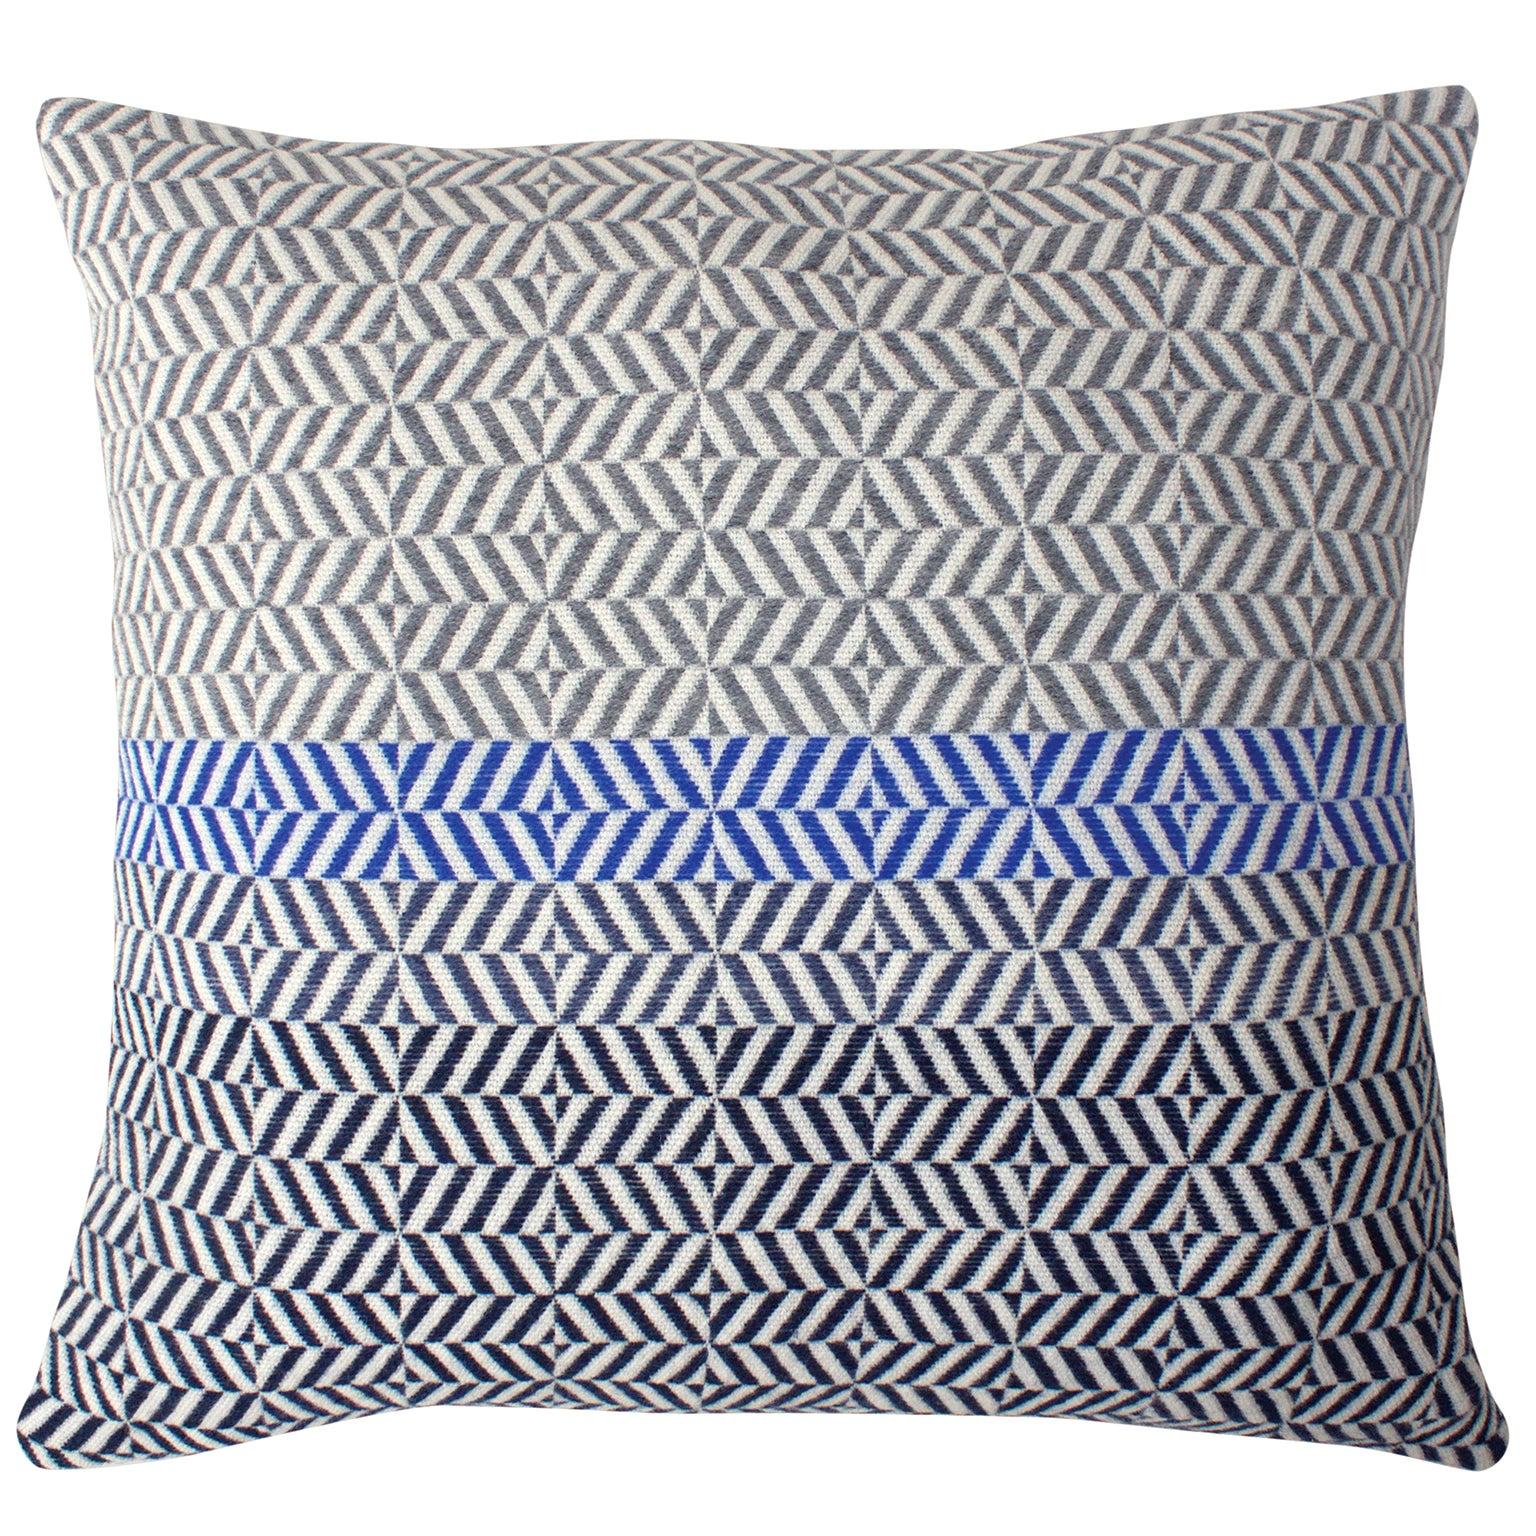 Handwoven 'Uccle' Block Geometric Merino Wool Cushion Pillow, Grey/Blue/Indigo